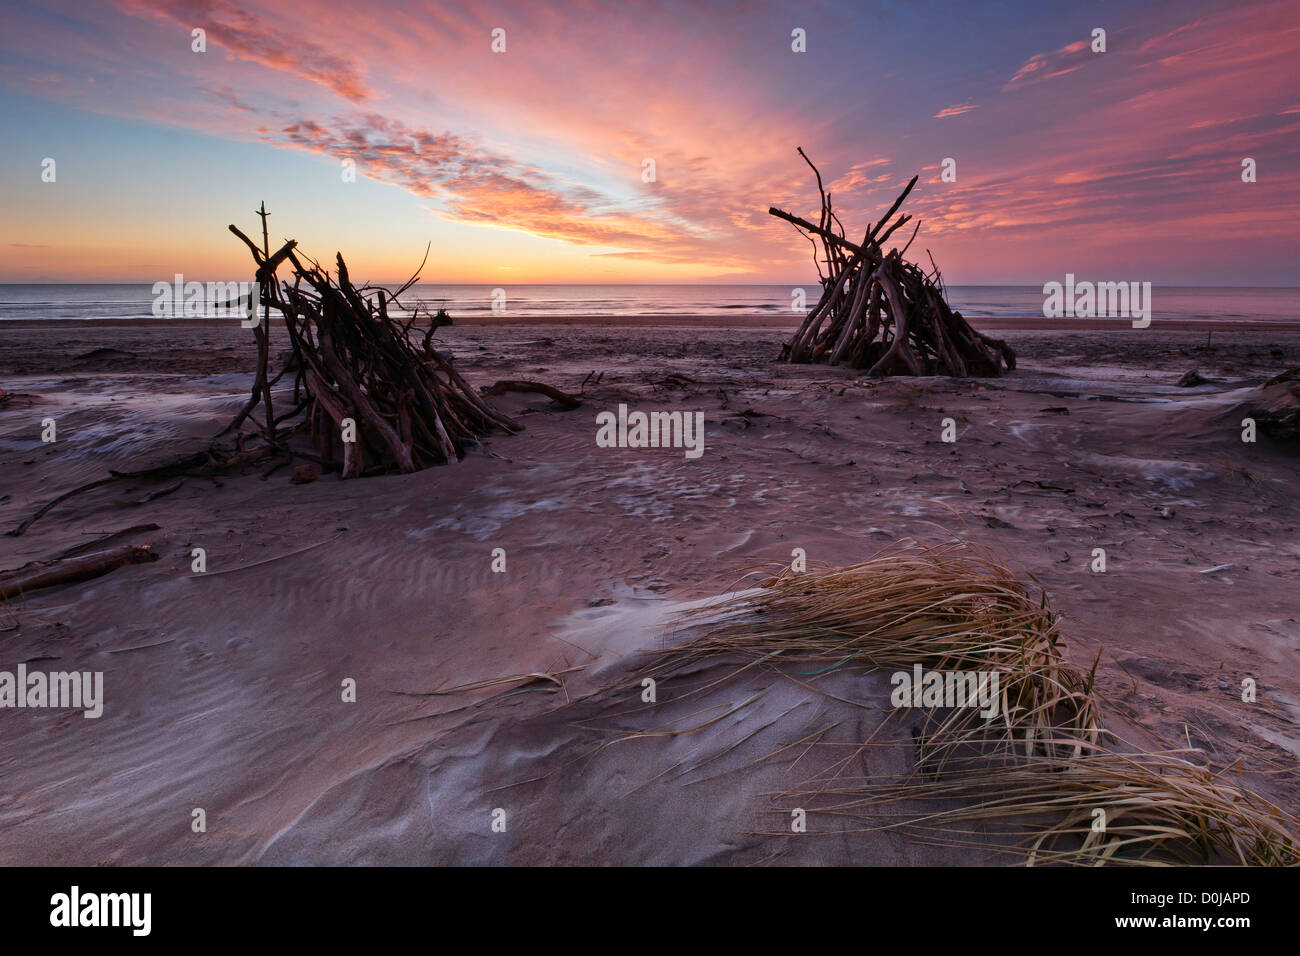 Treibholz blendet bei Sonnenaufgang am St Cyrus. Stockbild